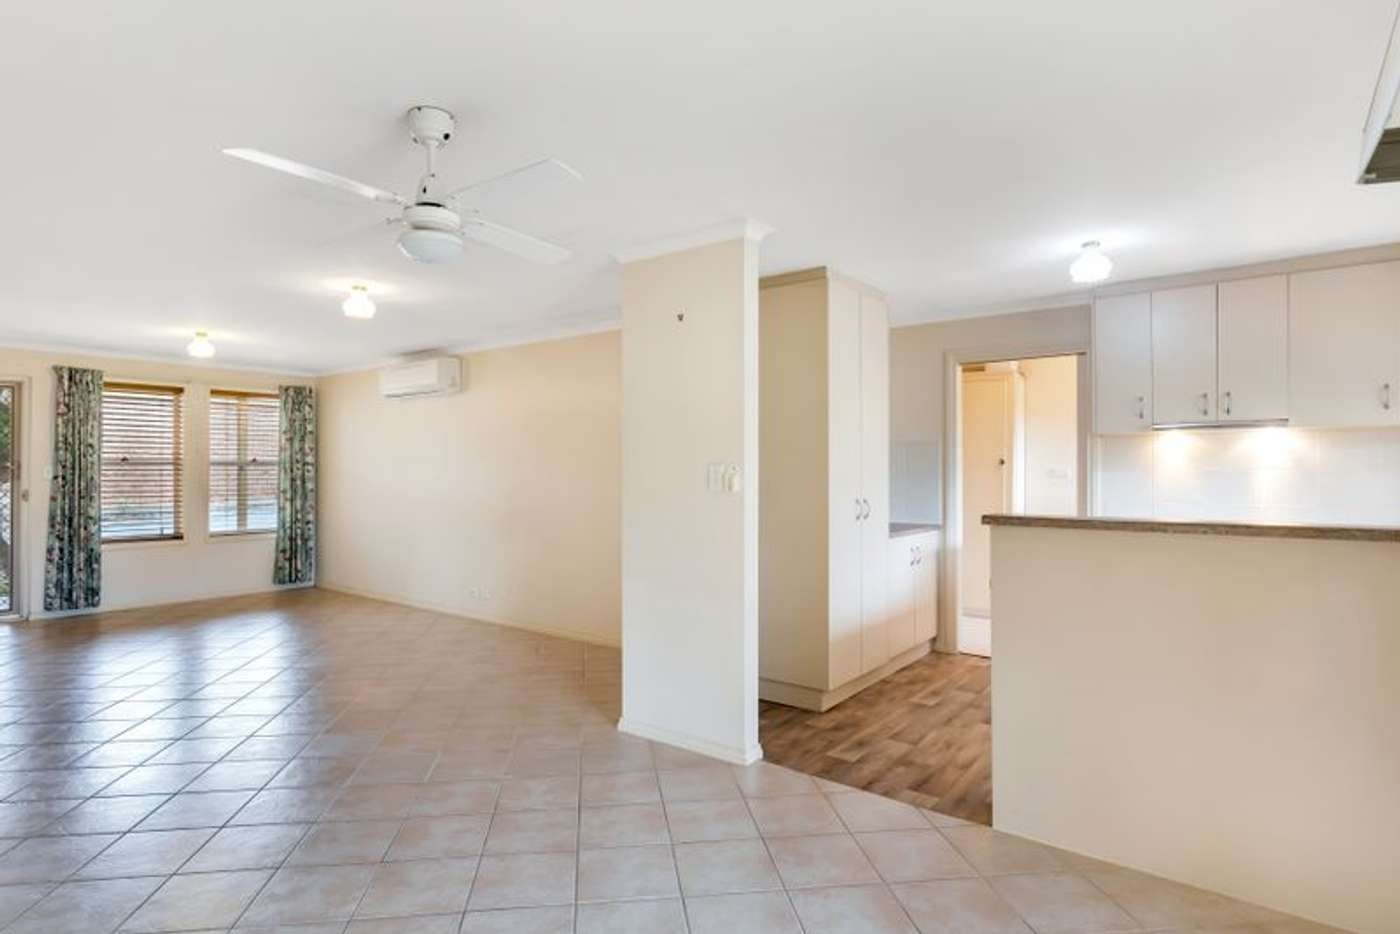 Seventh view of Homely unit listing, 12/164 HUB DRIVE, Aberfoyle Park SA 5159